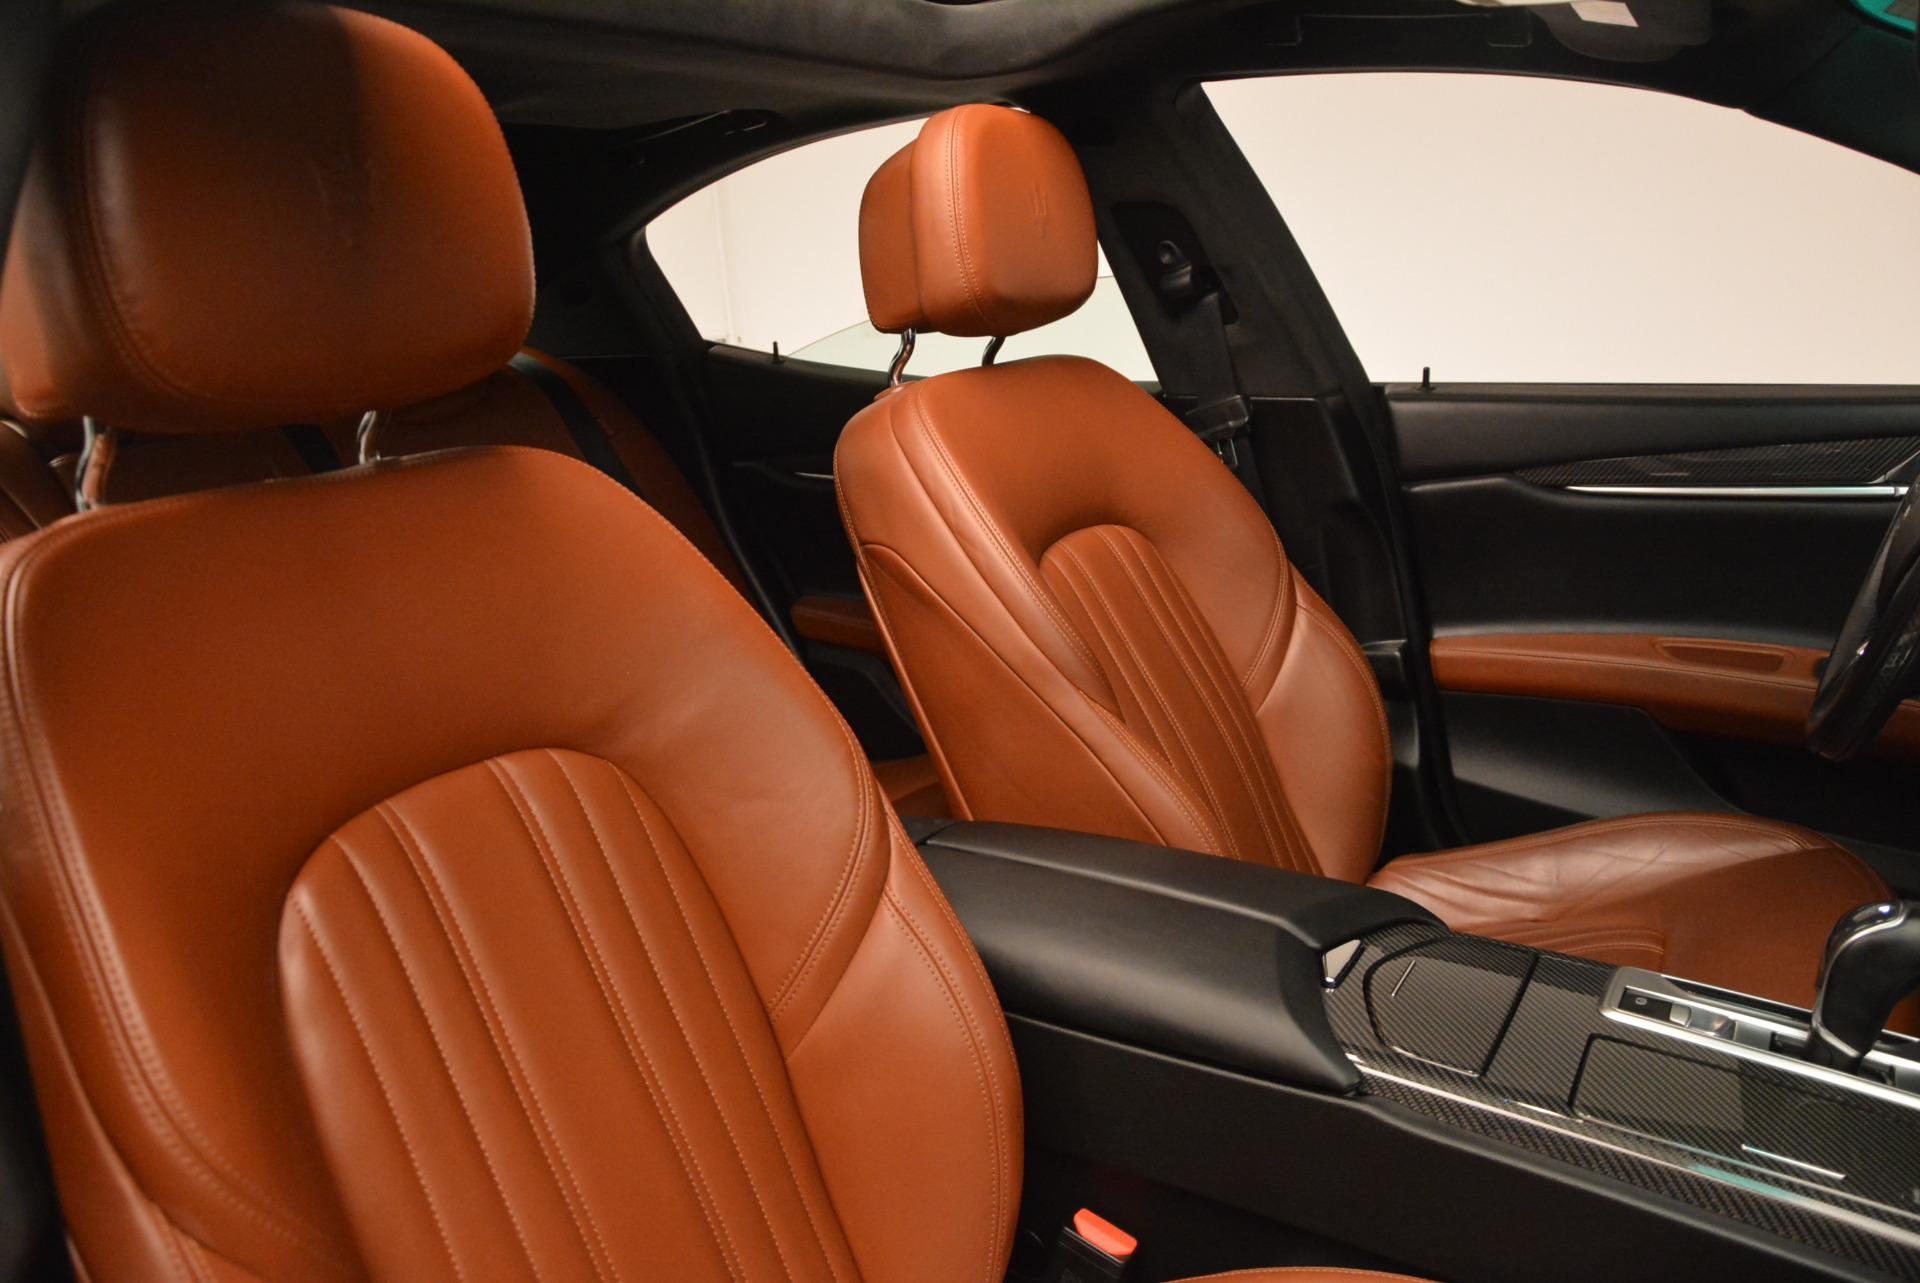 Used 2014 Maserati Ghibli S Q4 For Sale In Greenwich, CT. Alfa Romeo of Greenwich, 7132 805_p22